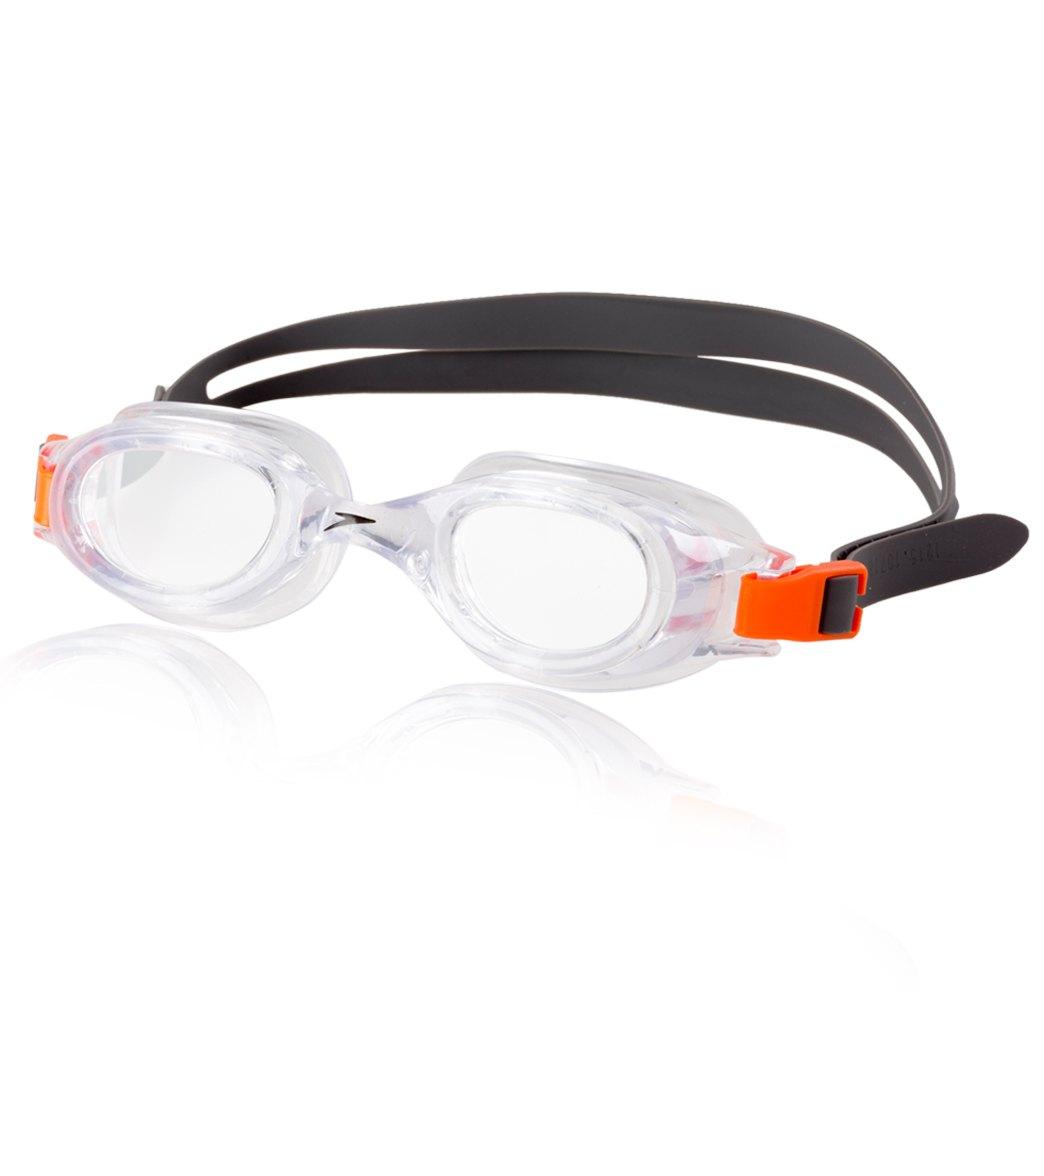 Speedo Hydrospex Classic Jr. Toddler Swimming Goggles